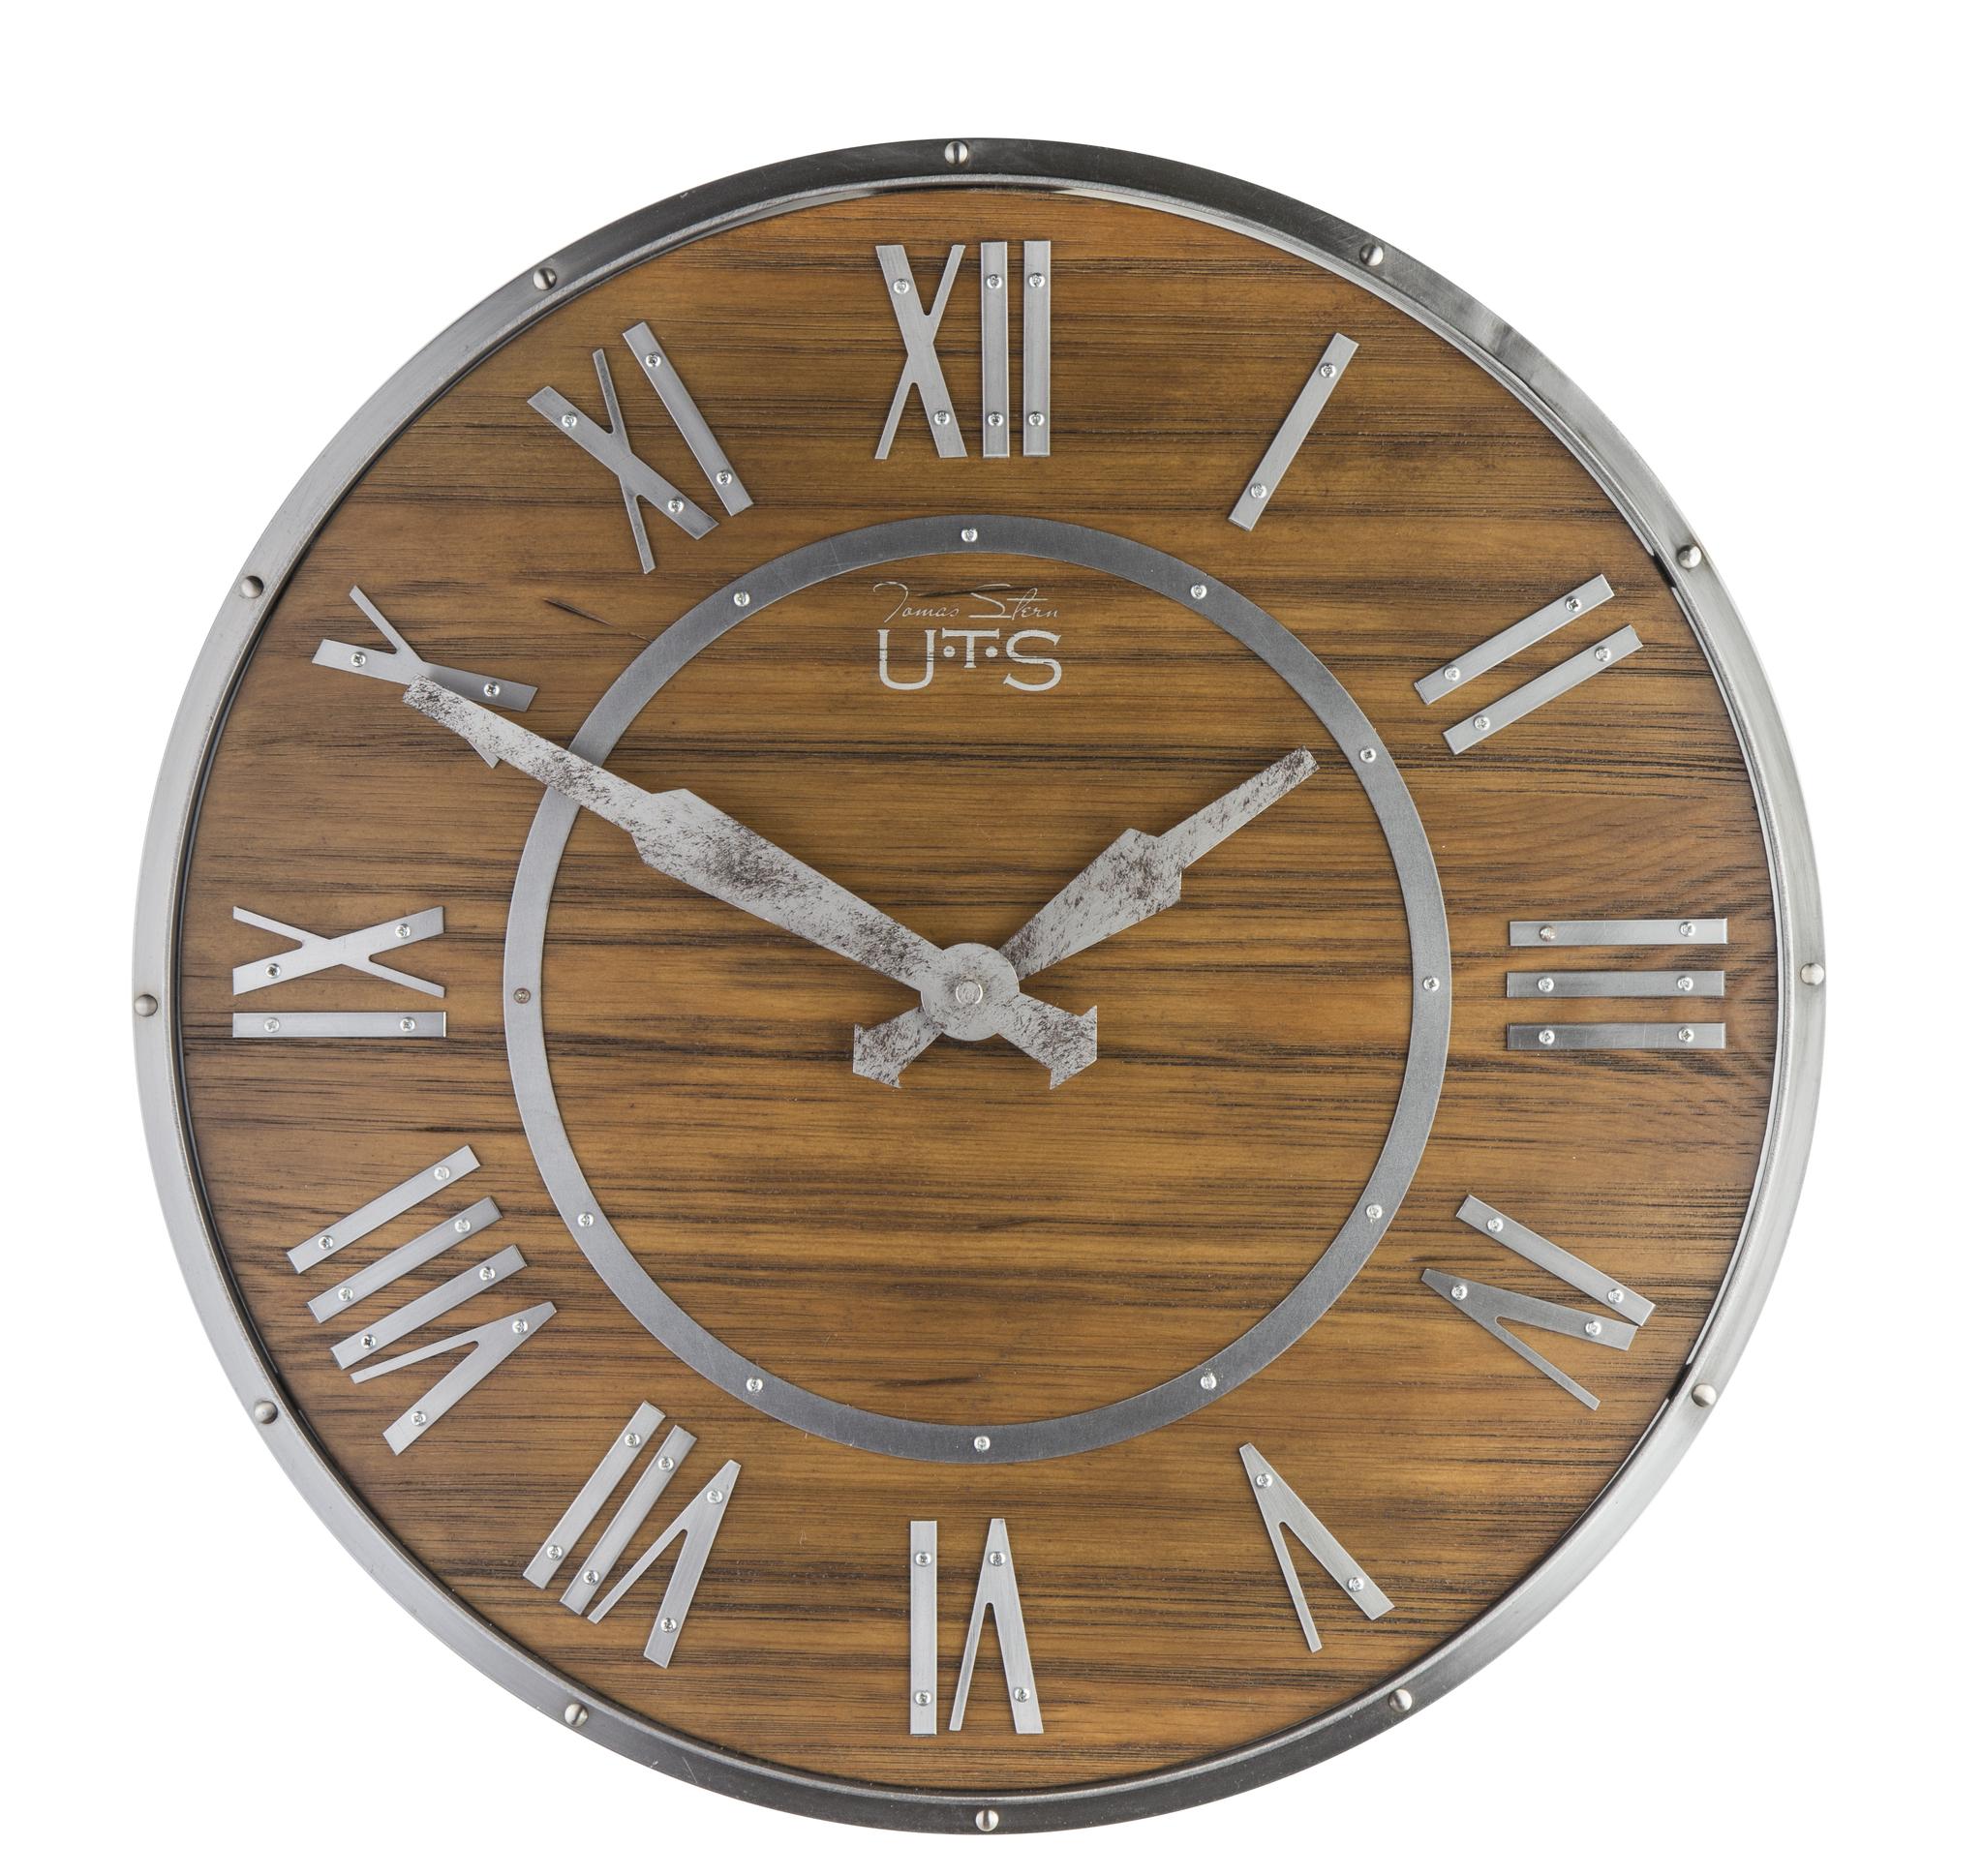 Часы настенные Часы настенные Tomas Stern 9035 chasy-nastennye-tomas-stern-9035-germaniya.jpg